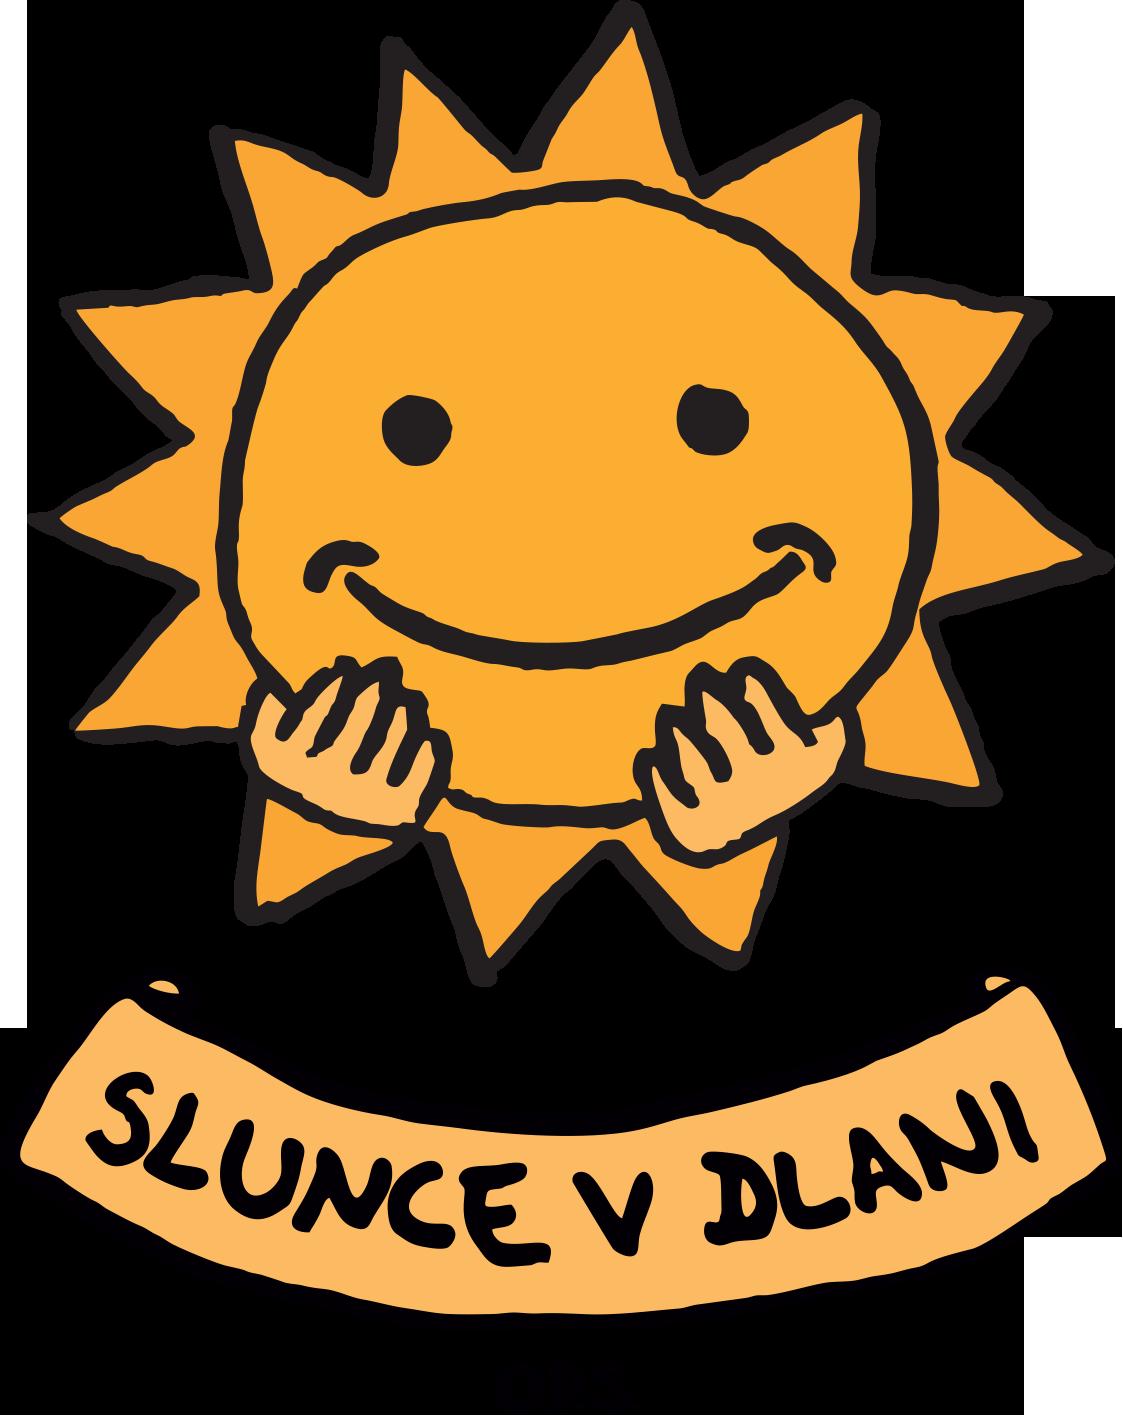 Slunce vdlani